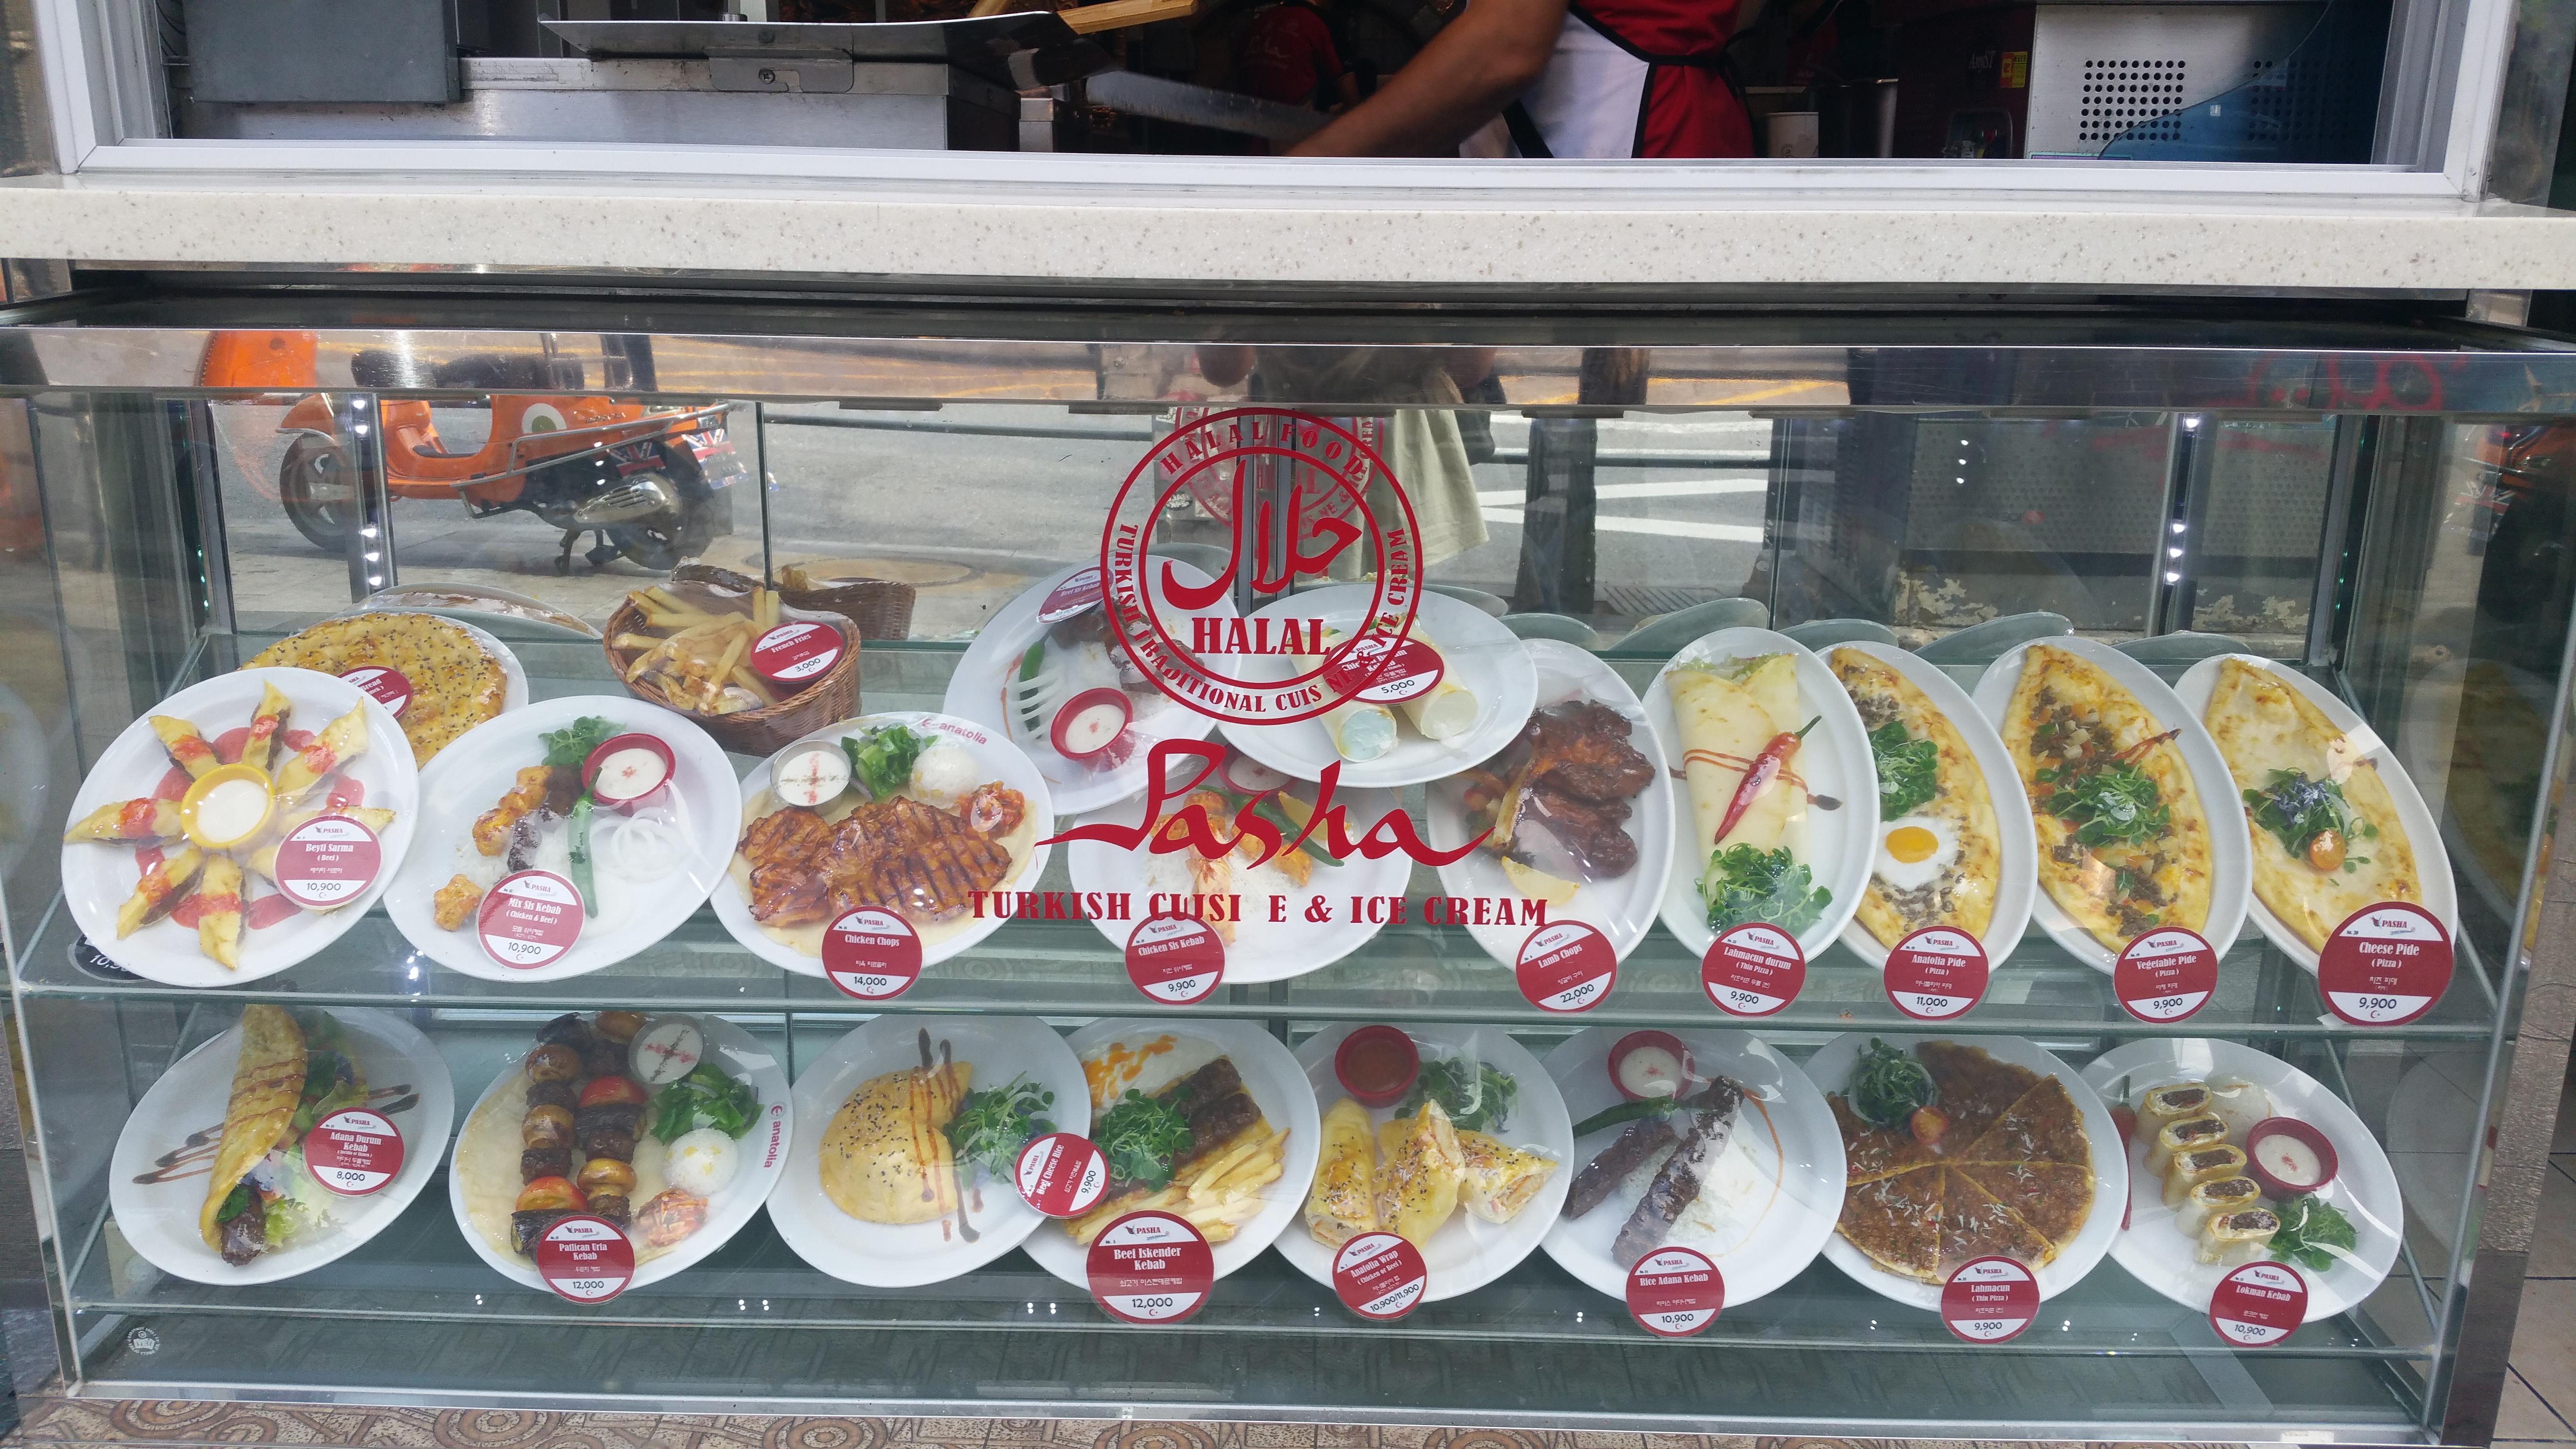 Pasha Turkish Food & Kebab [Halal]